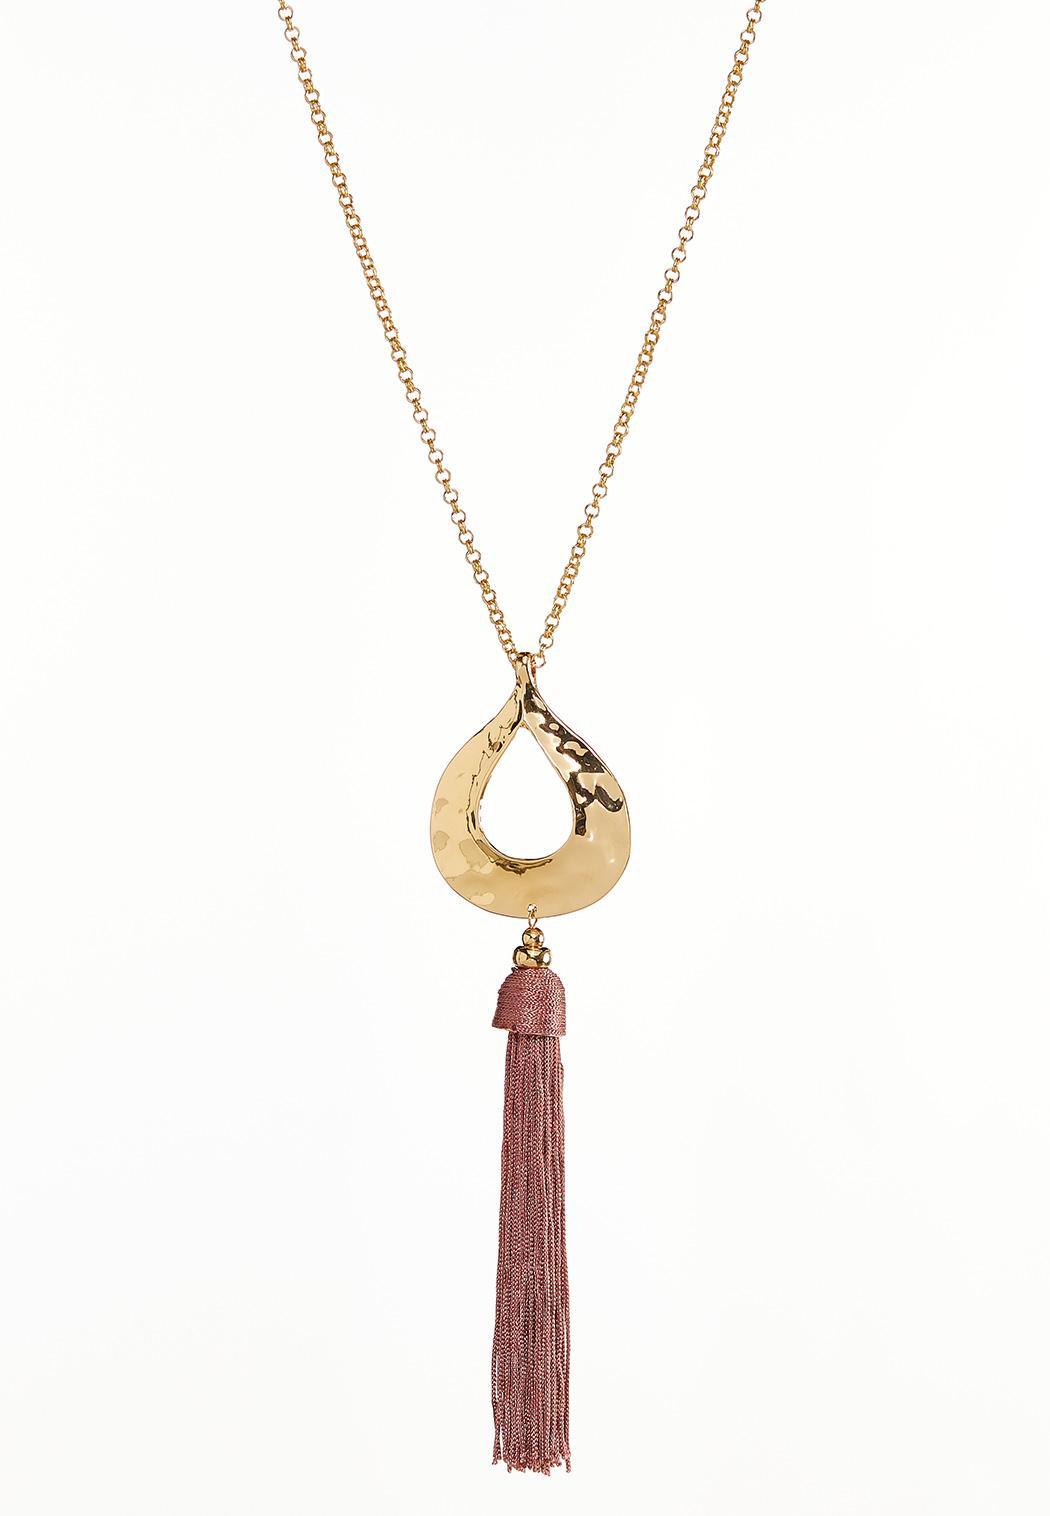 Hammered Tear Pendant Necklace